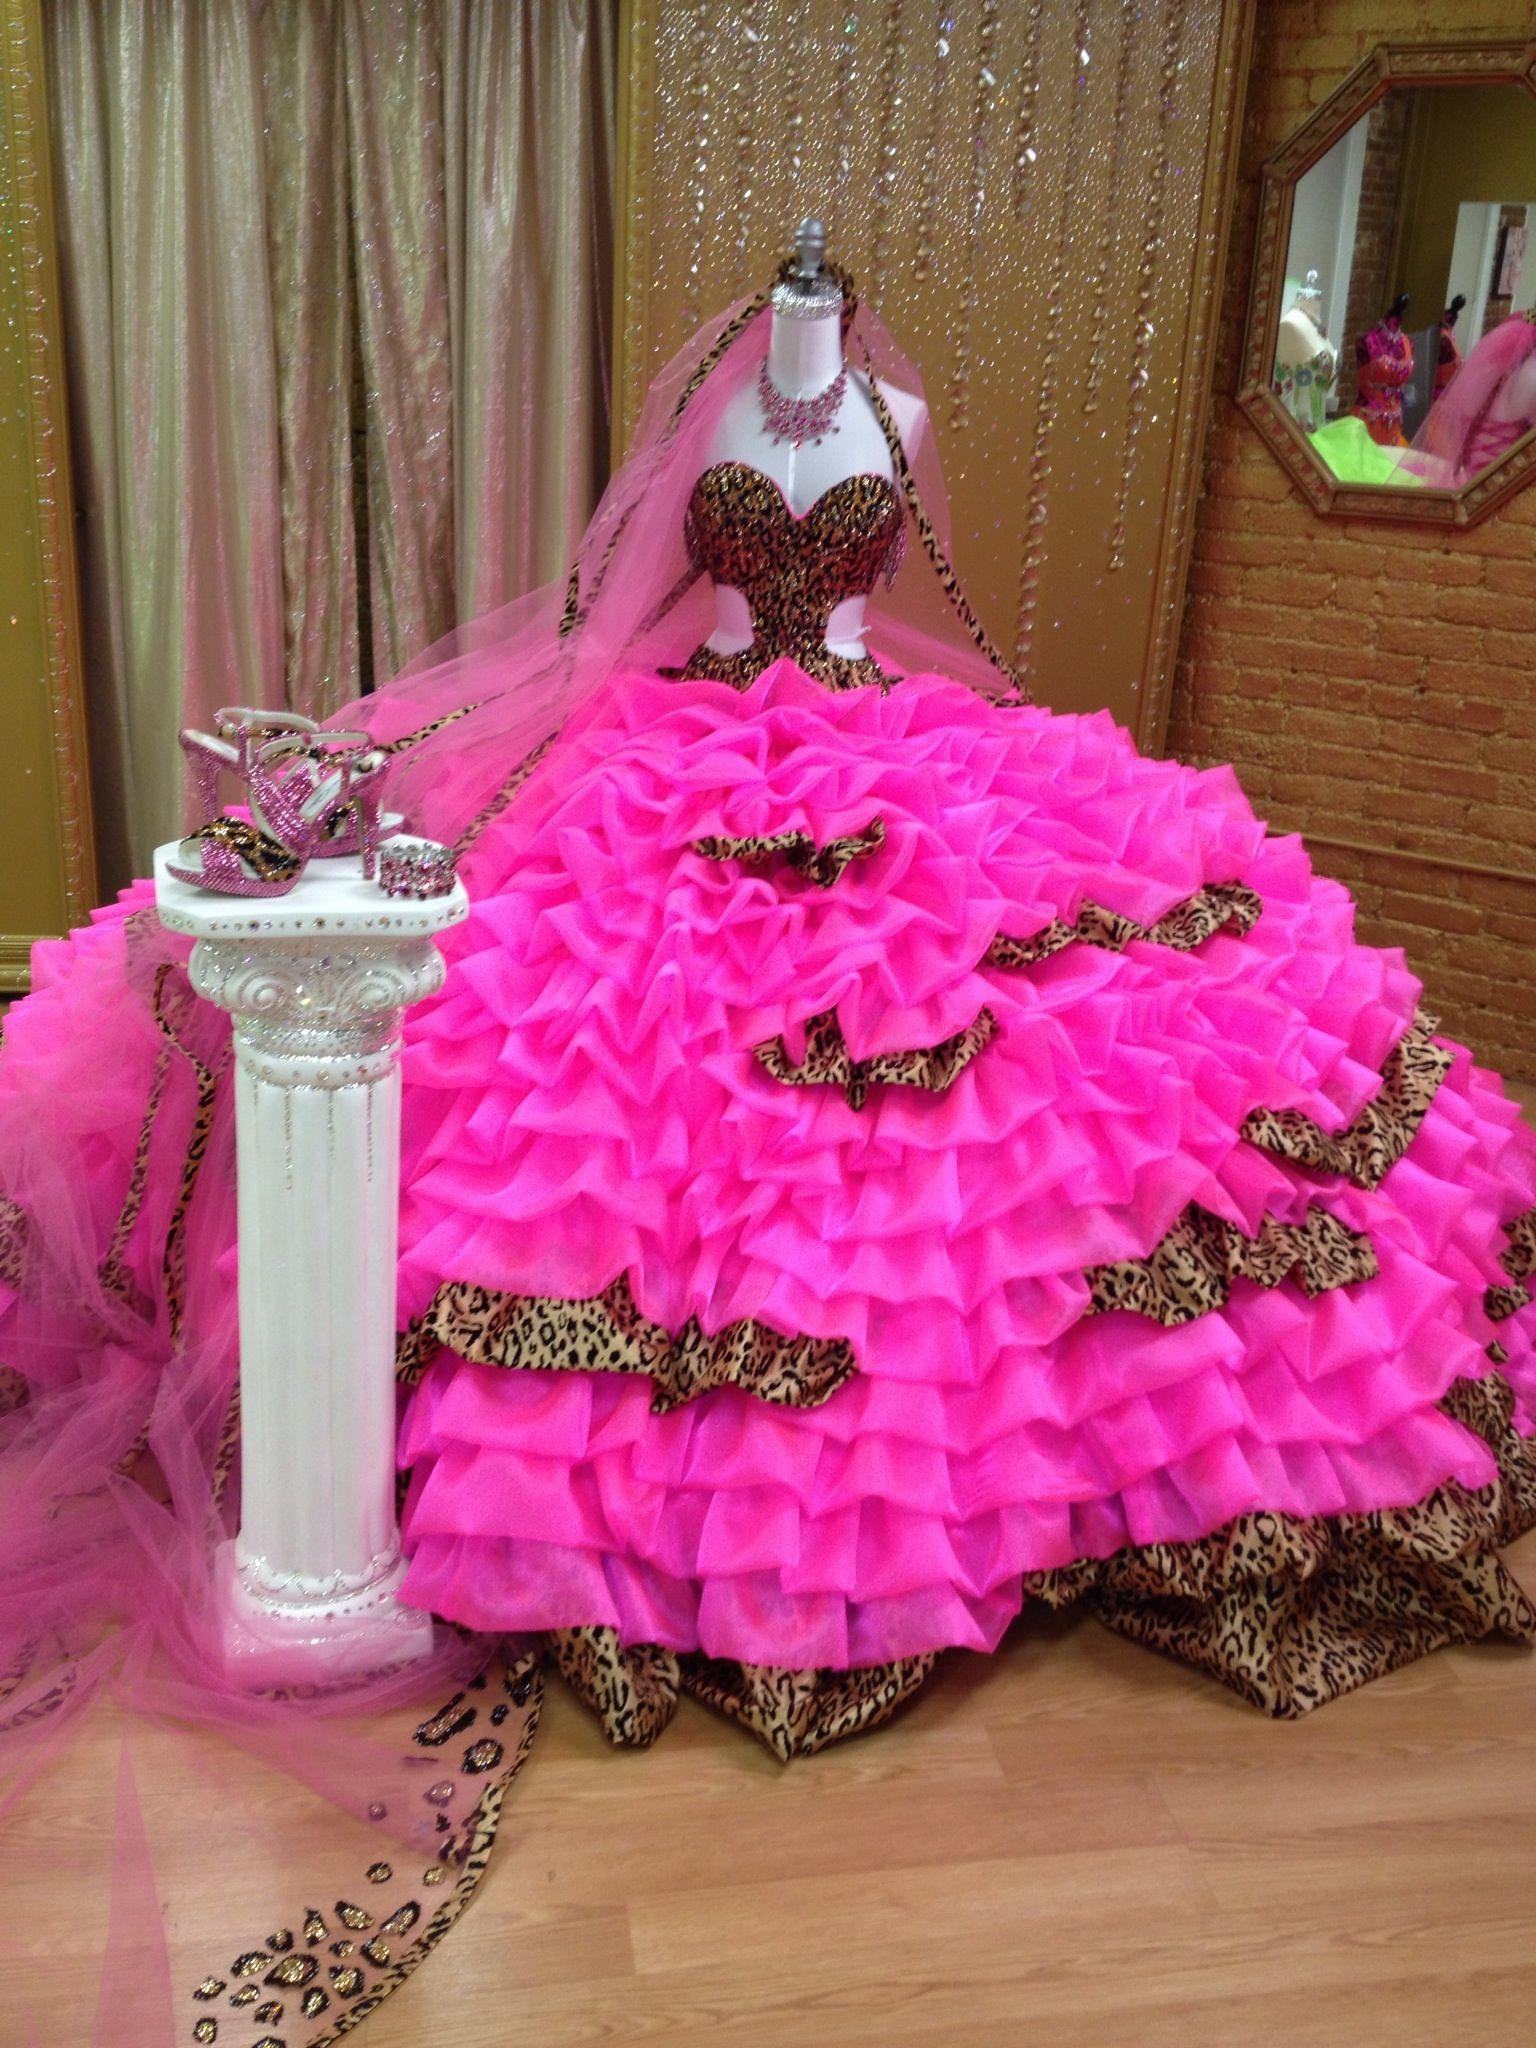 Mellie Stanley's custom wedding dress by Sondra Celli